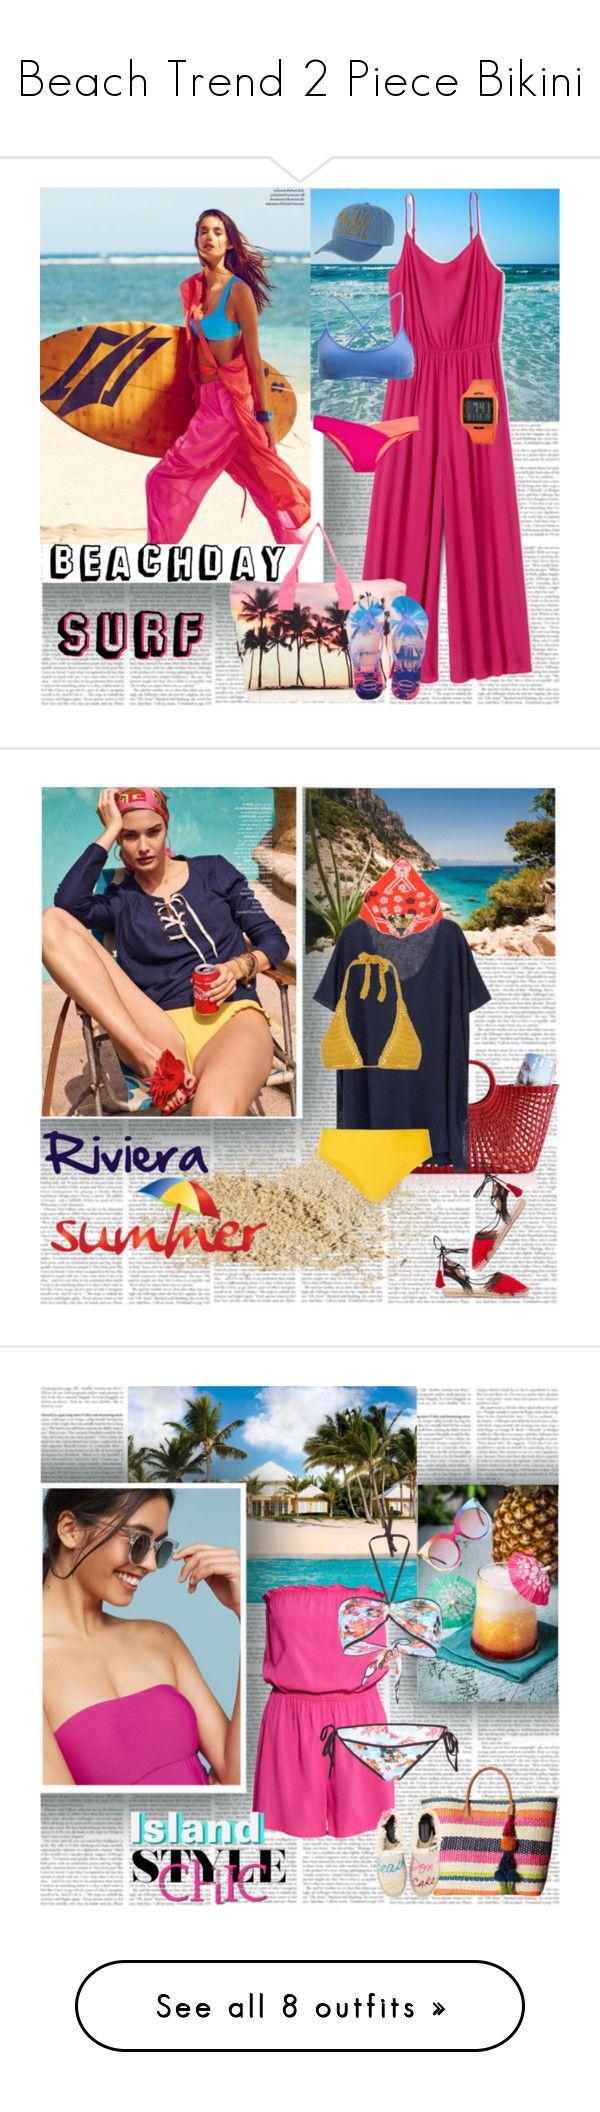 """Beach Trend 2 Piece Bikini"" by stylepersonal ❤ liked on Polyvore featuring Elora, Samudra, Rip Curl, Victoria's Secret, Billabong, Vestal, Havaianas, beachday, Mark & Graham and Iris & Ink"